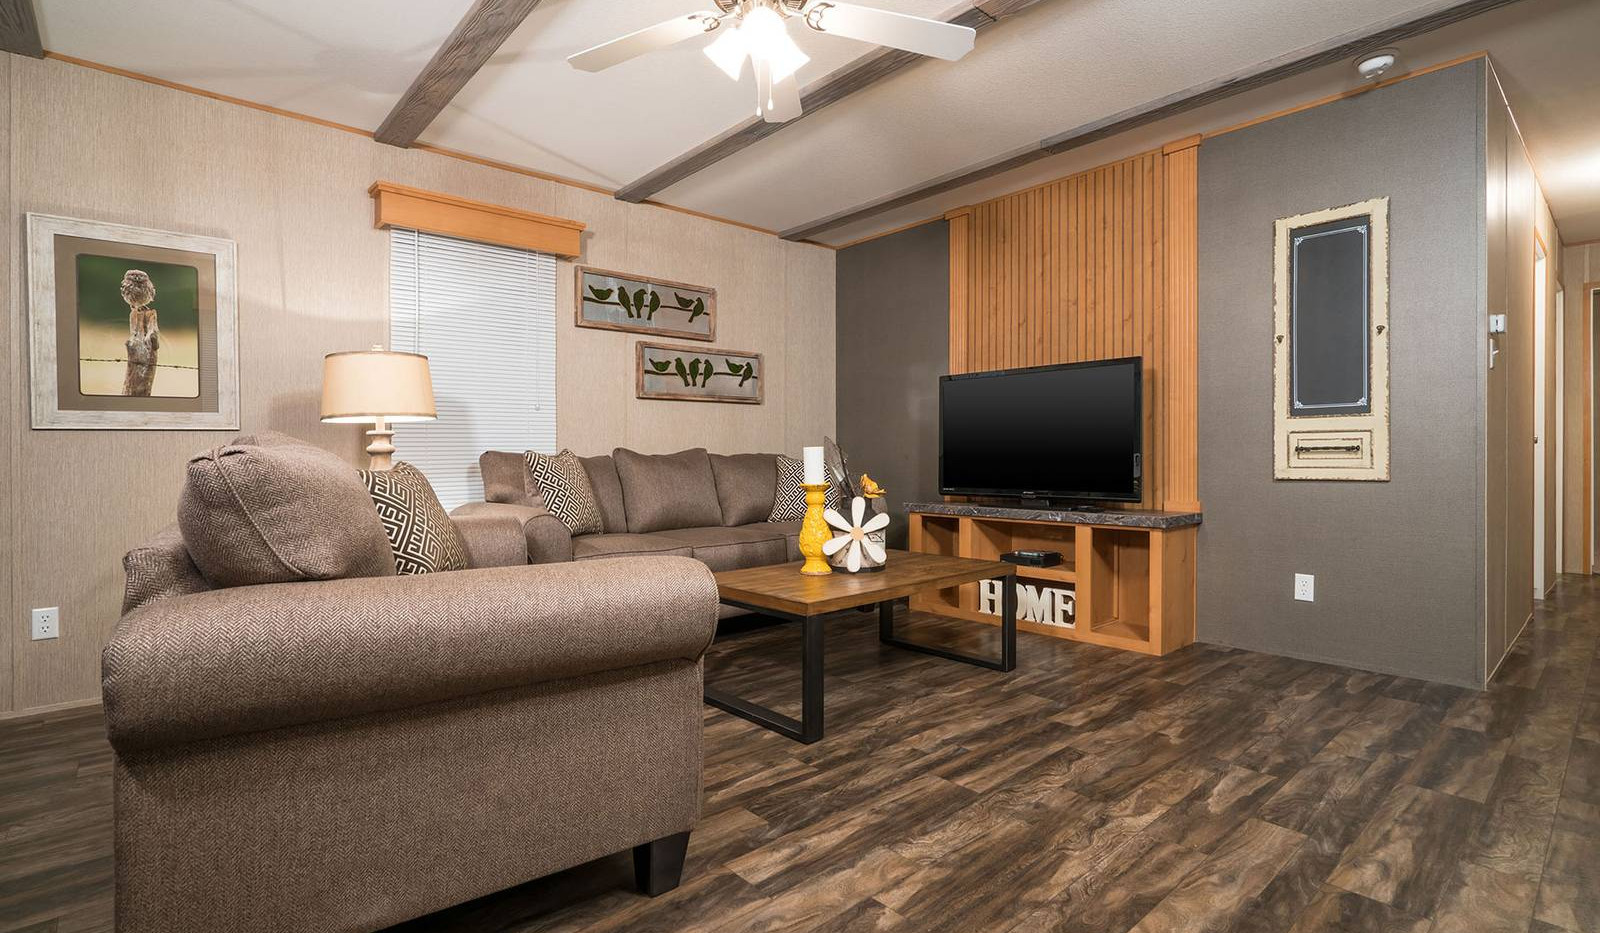 4-select-1676c-living-room-1-1600x1068.j